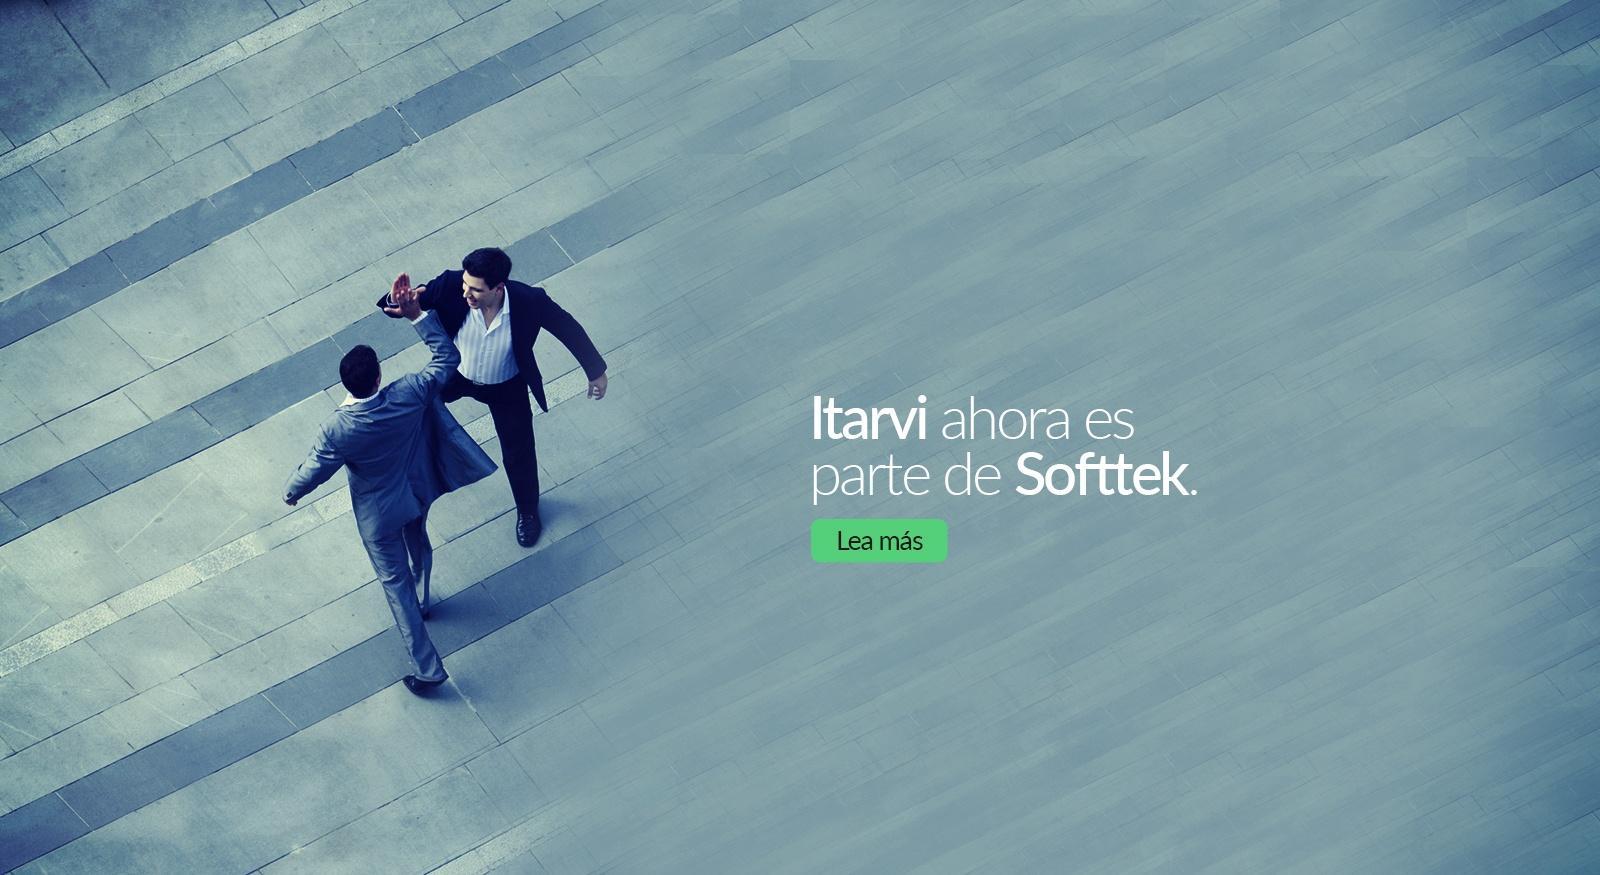 Itarvi ahora es parte de Softtek